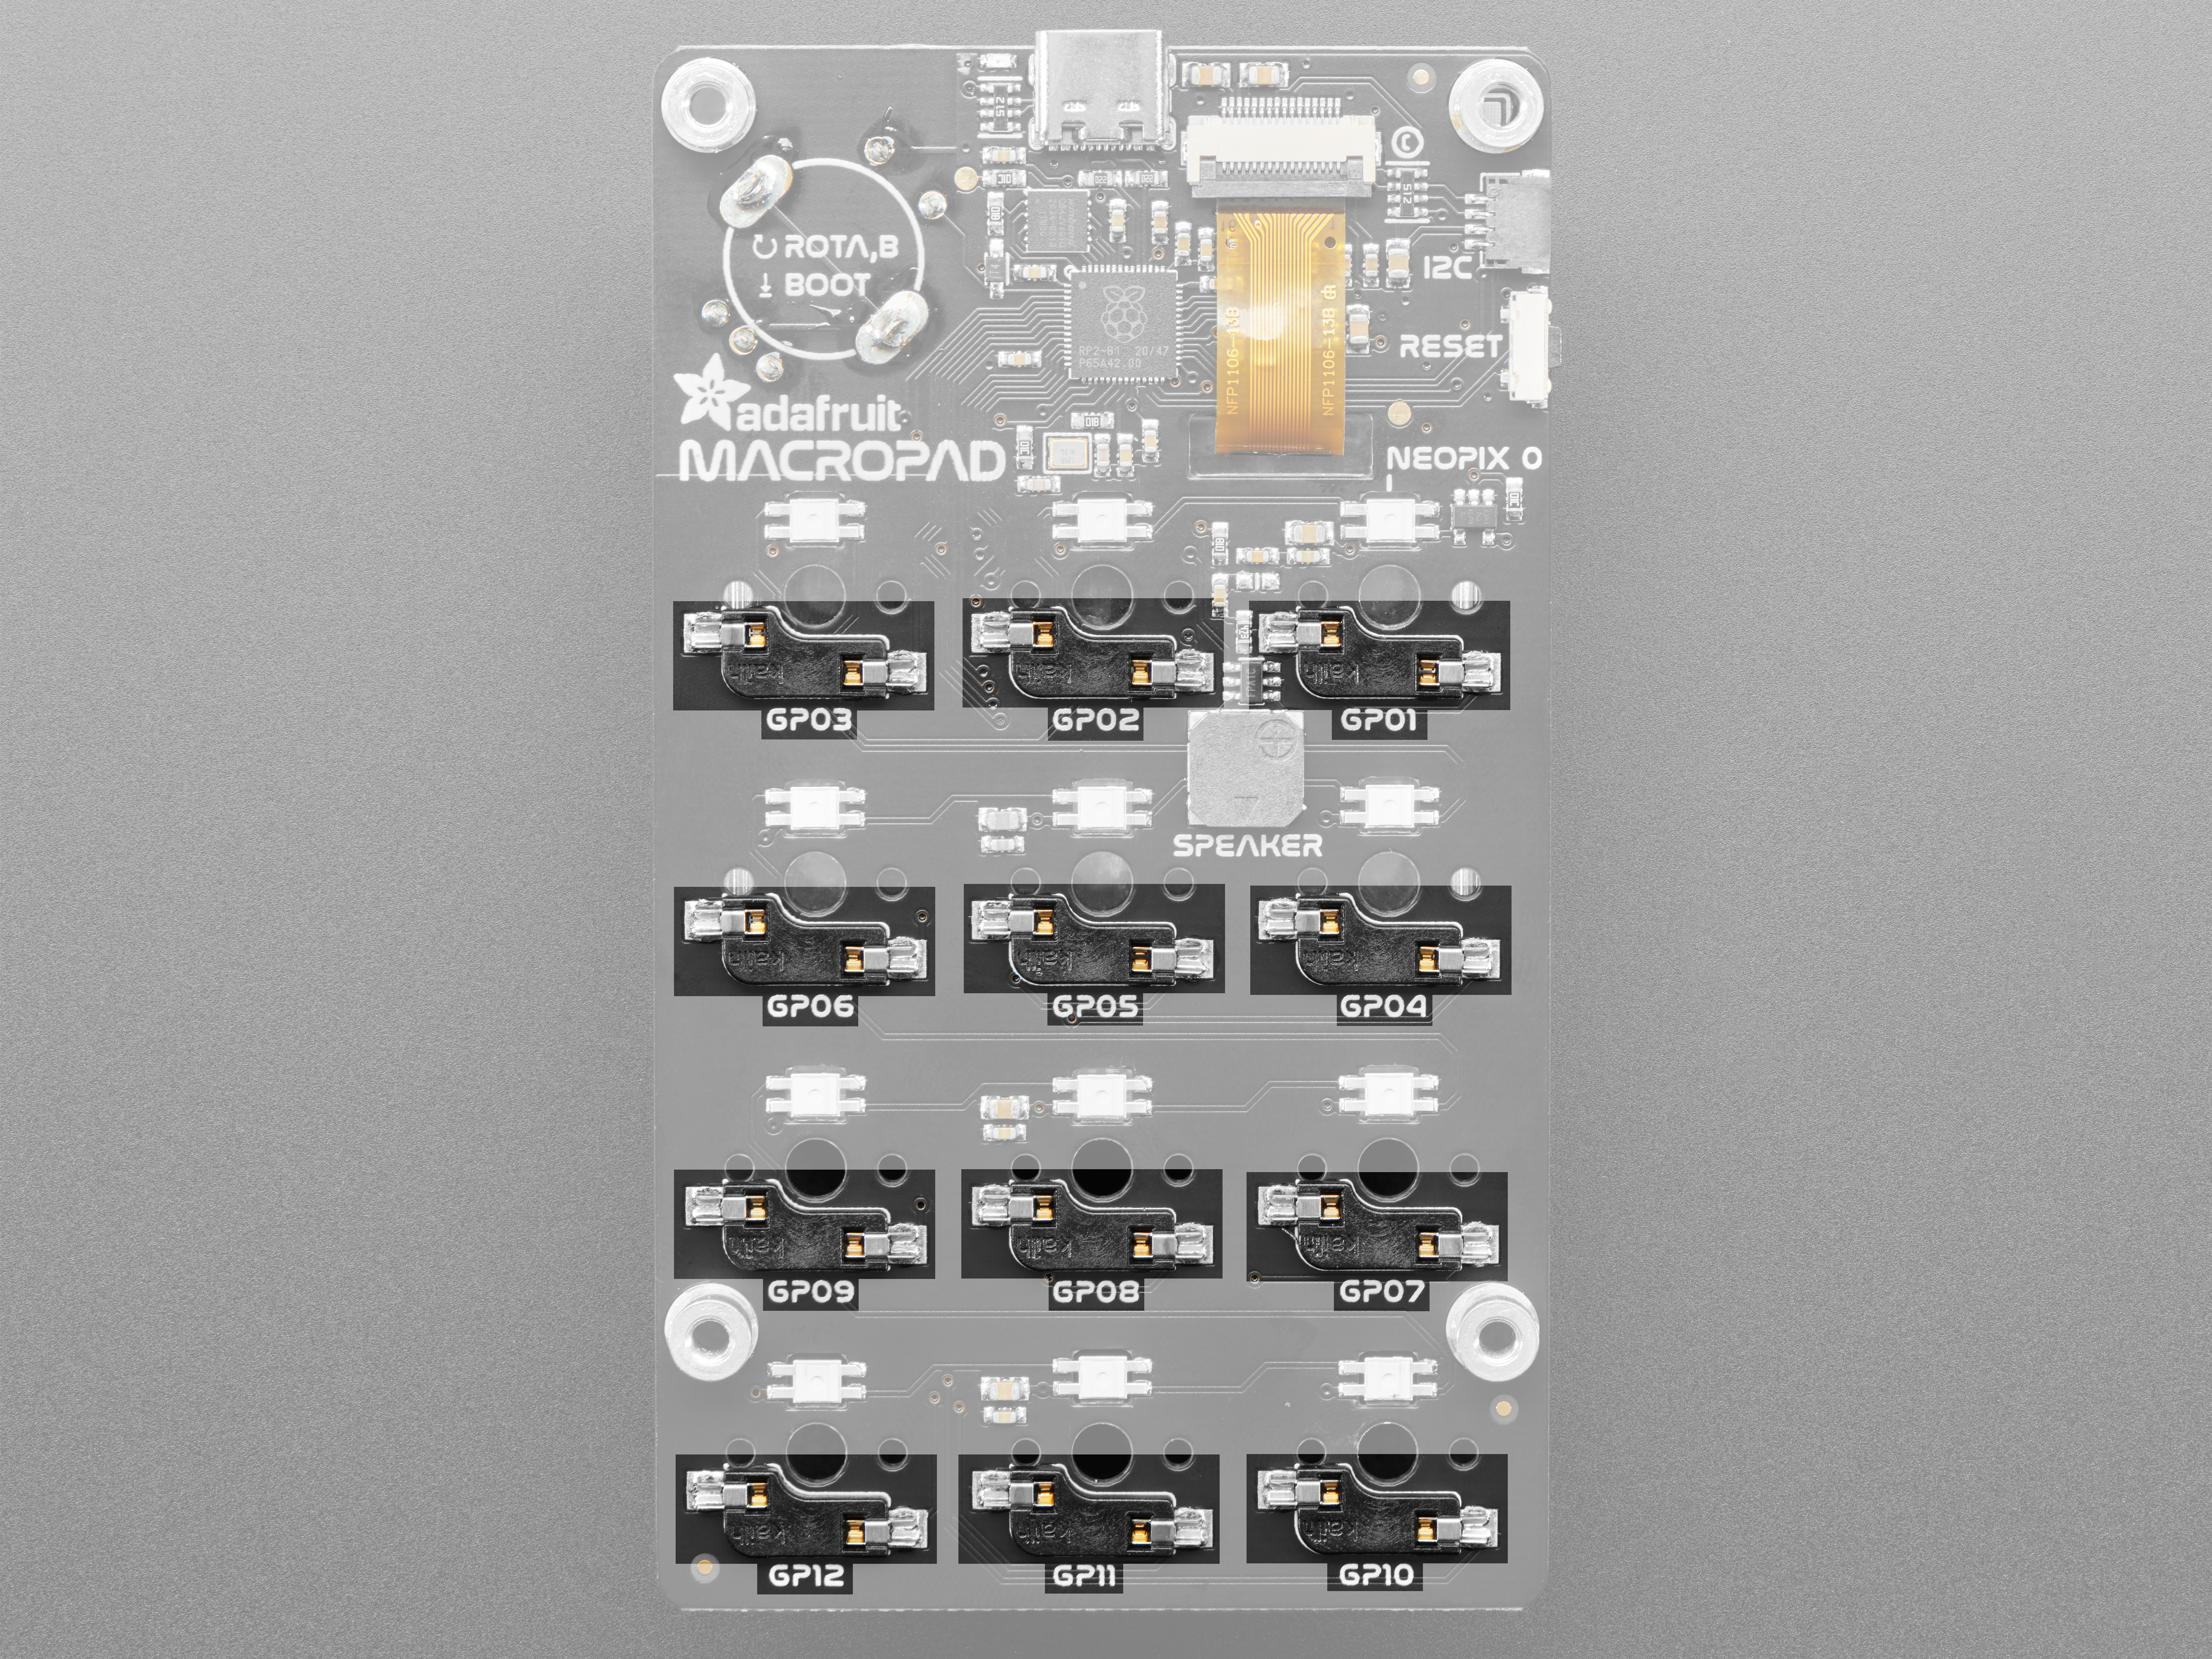 adafruit_products_MacroPad_pinouts_keyswitch_sockets_back.jpg